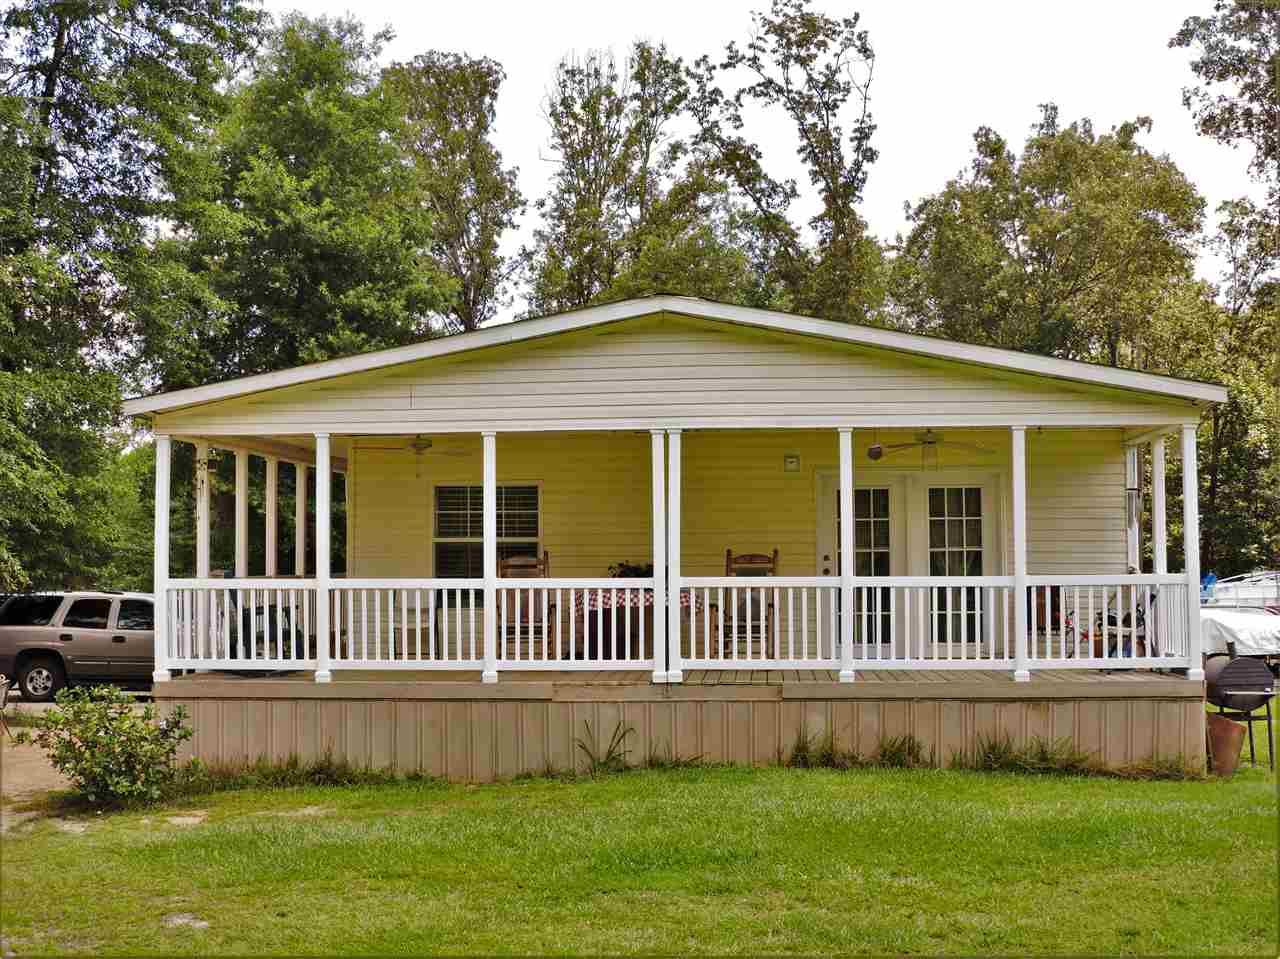 Real Estate for Sale, ListingId: 35638030, Morton,MS39117